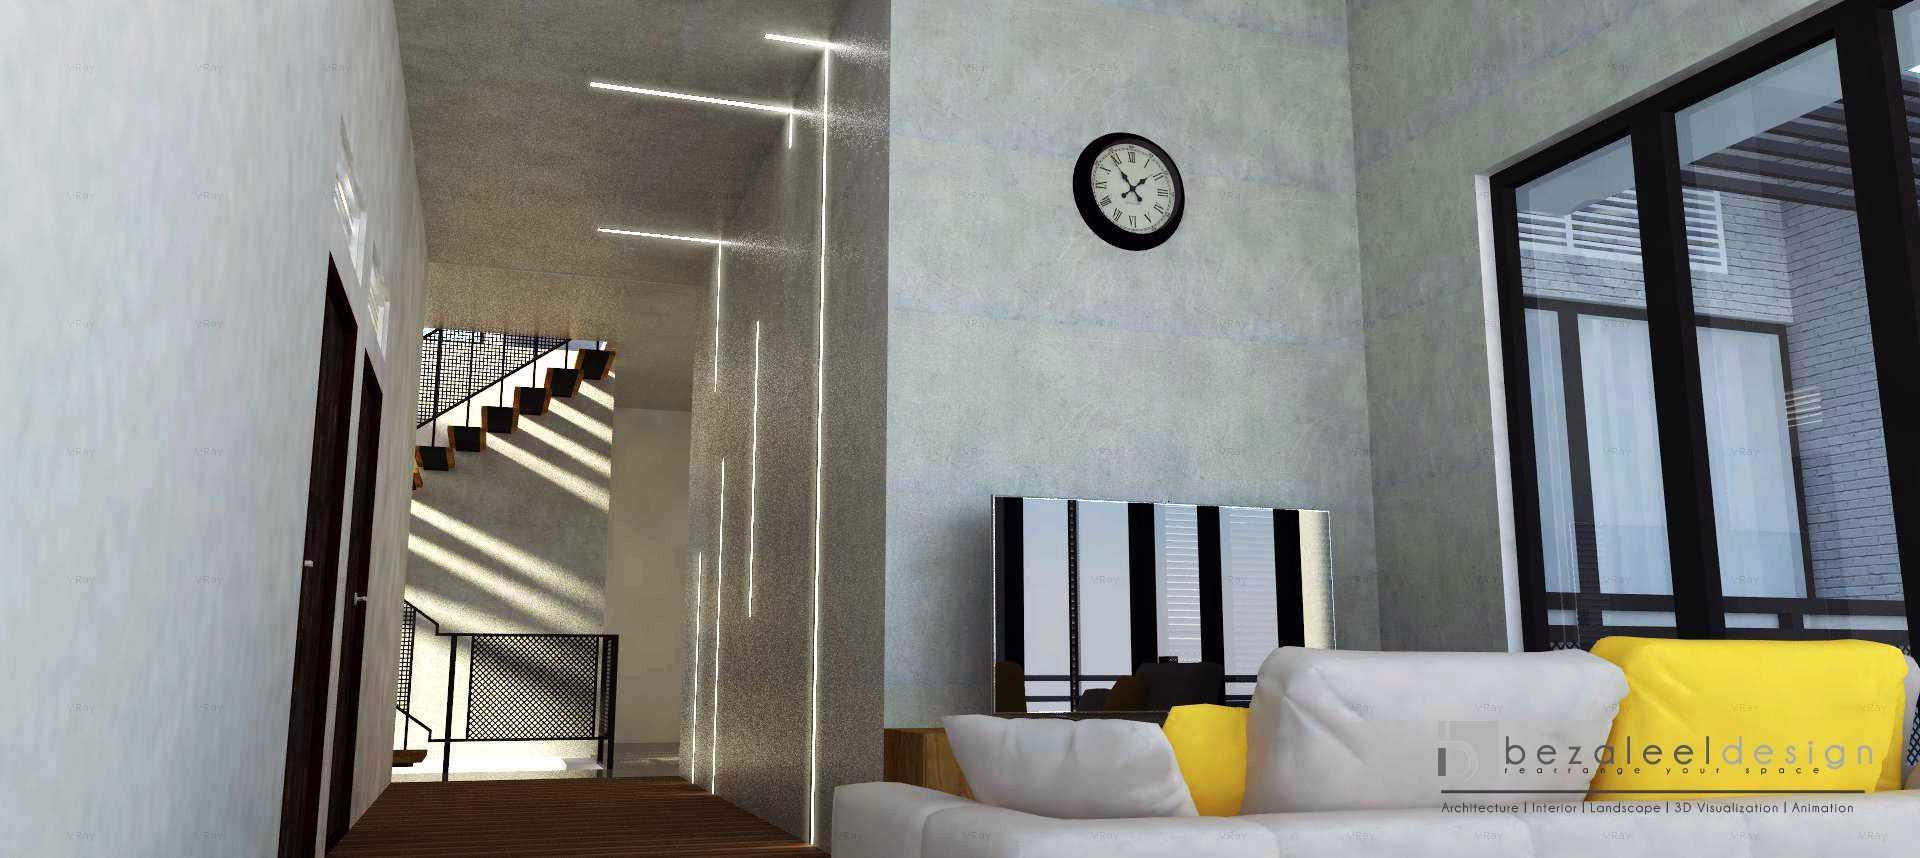 Localic Studio Breathing House Bintaro, Pesanggrahan, South Jakarta City, Jakarta, Indonesia Bintaro Breathing House - Living Room  Ruang Keluarga Lantai 2 Dengan Dikelilingi Bukaan Sehingga Mendapatkan Sirkulasi Udara Yang Maksimal. 15679